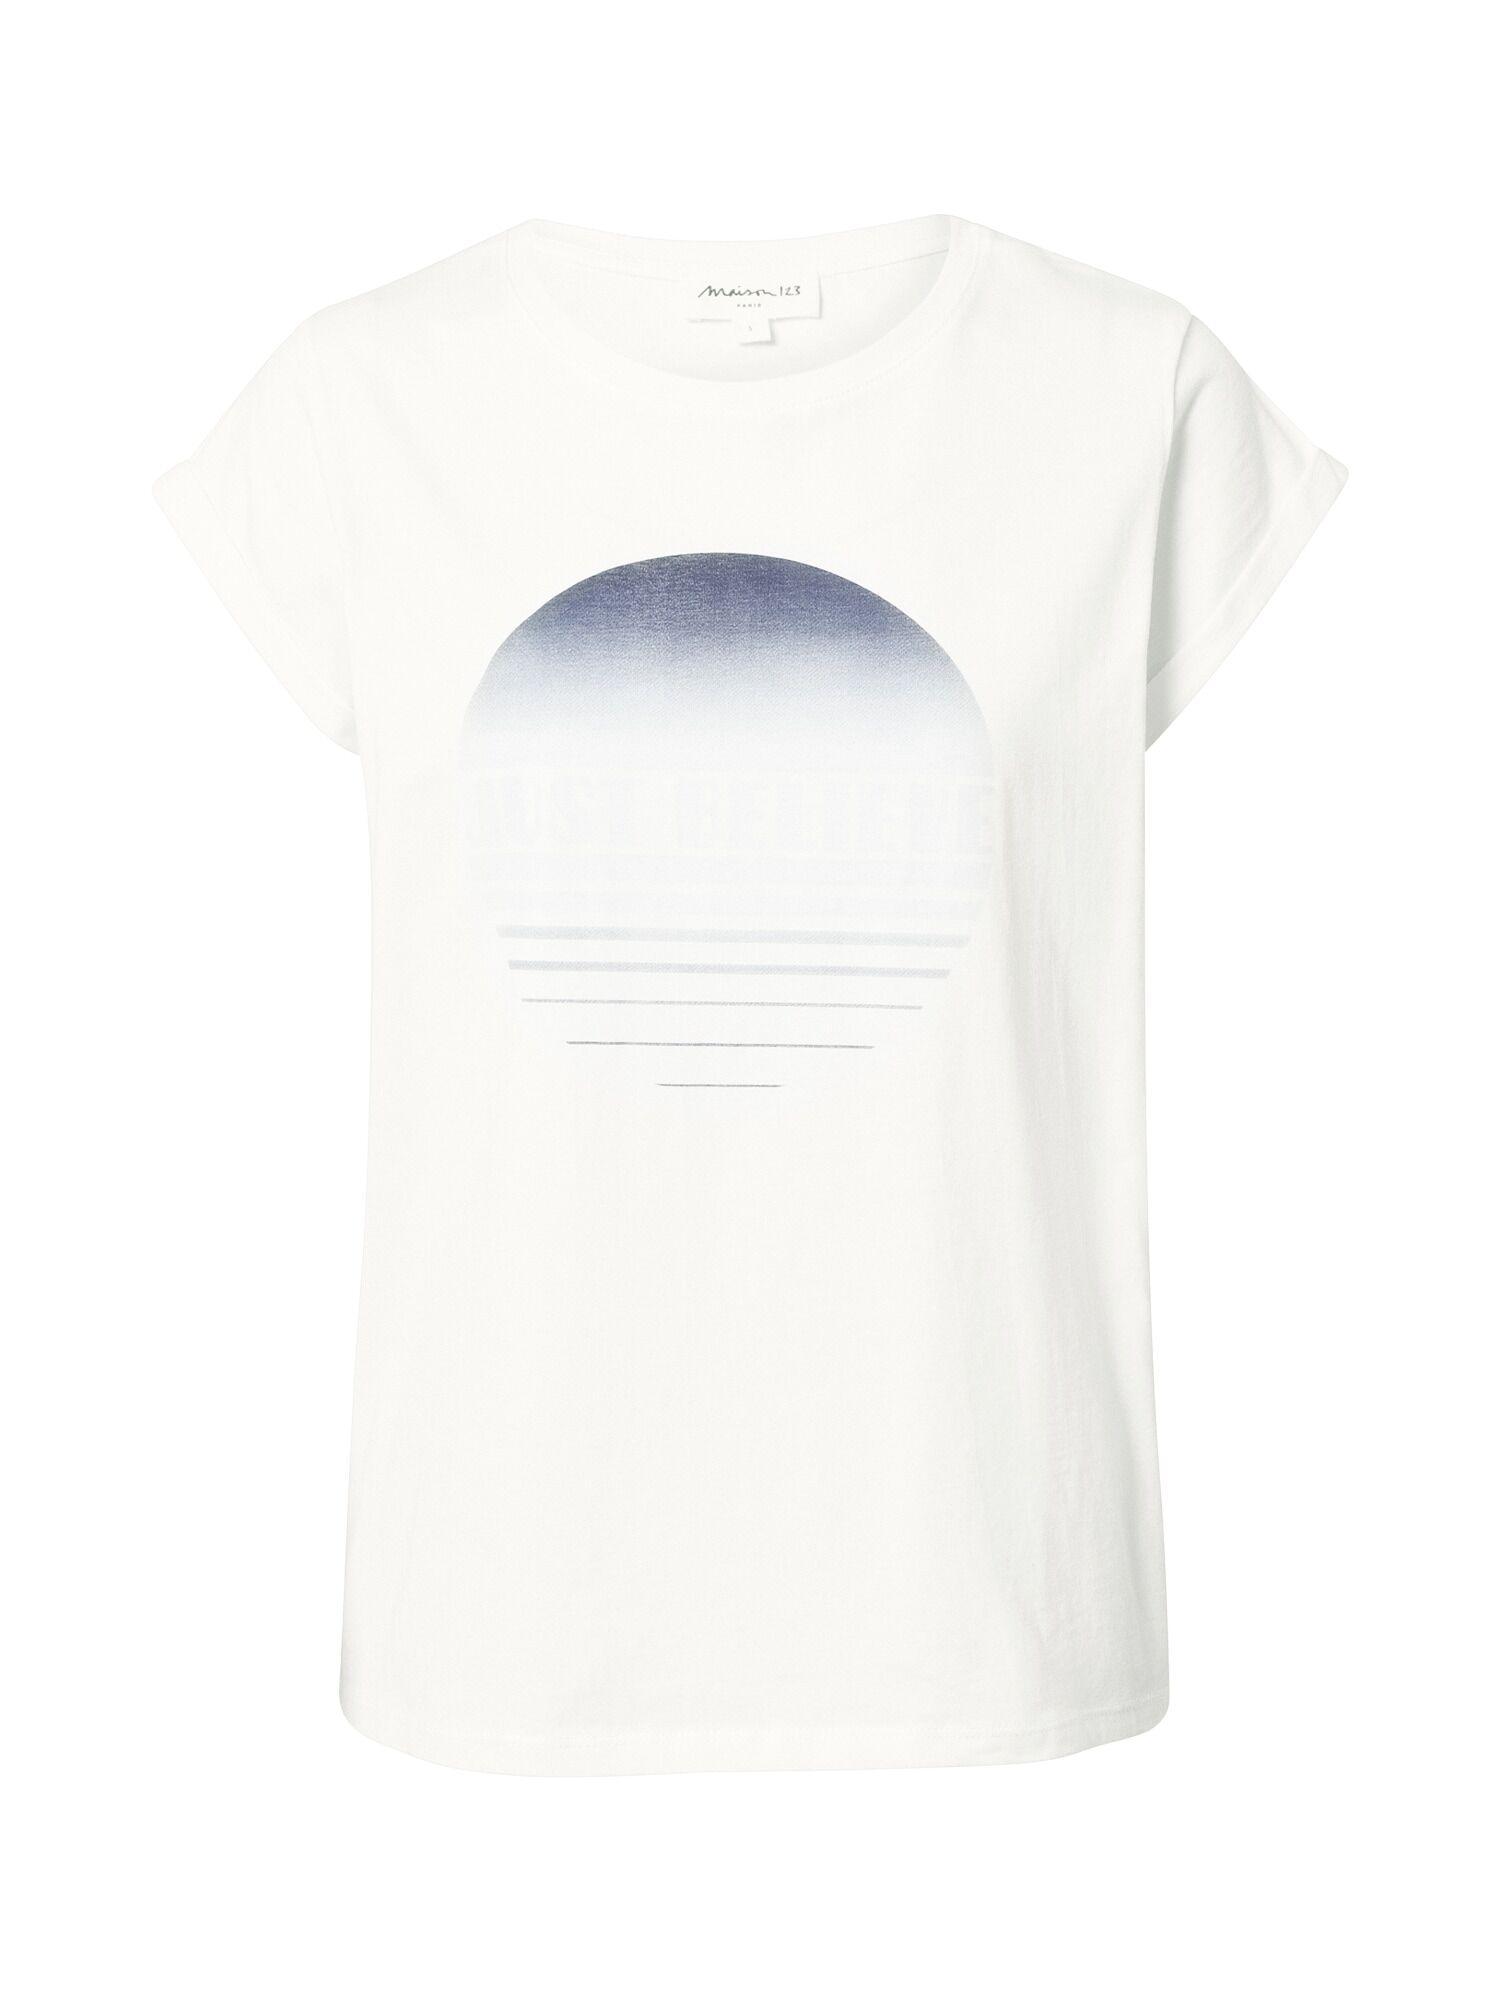 Maison 123 T-shirt 'INNOCENT'  - Beige - Taille: S - female